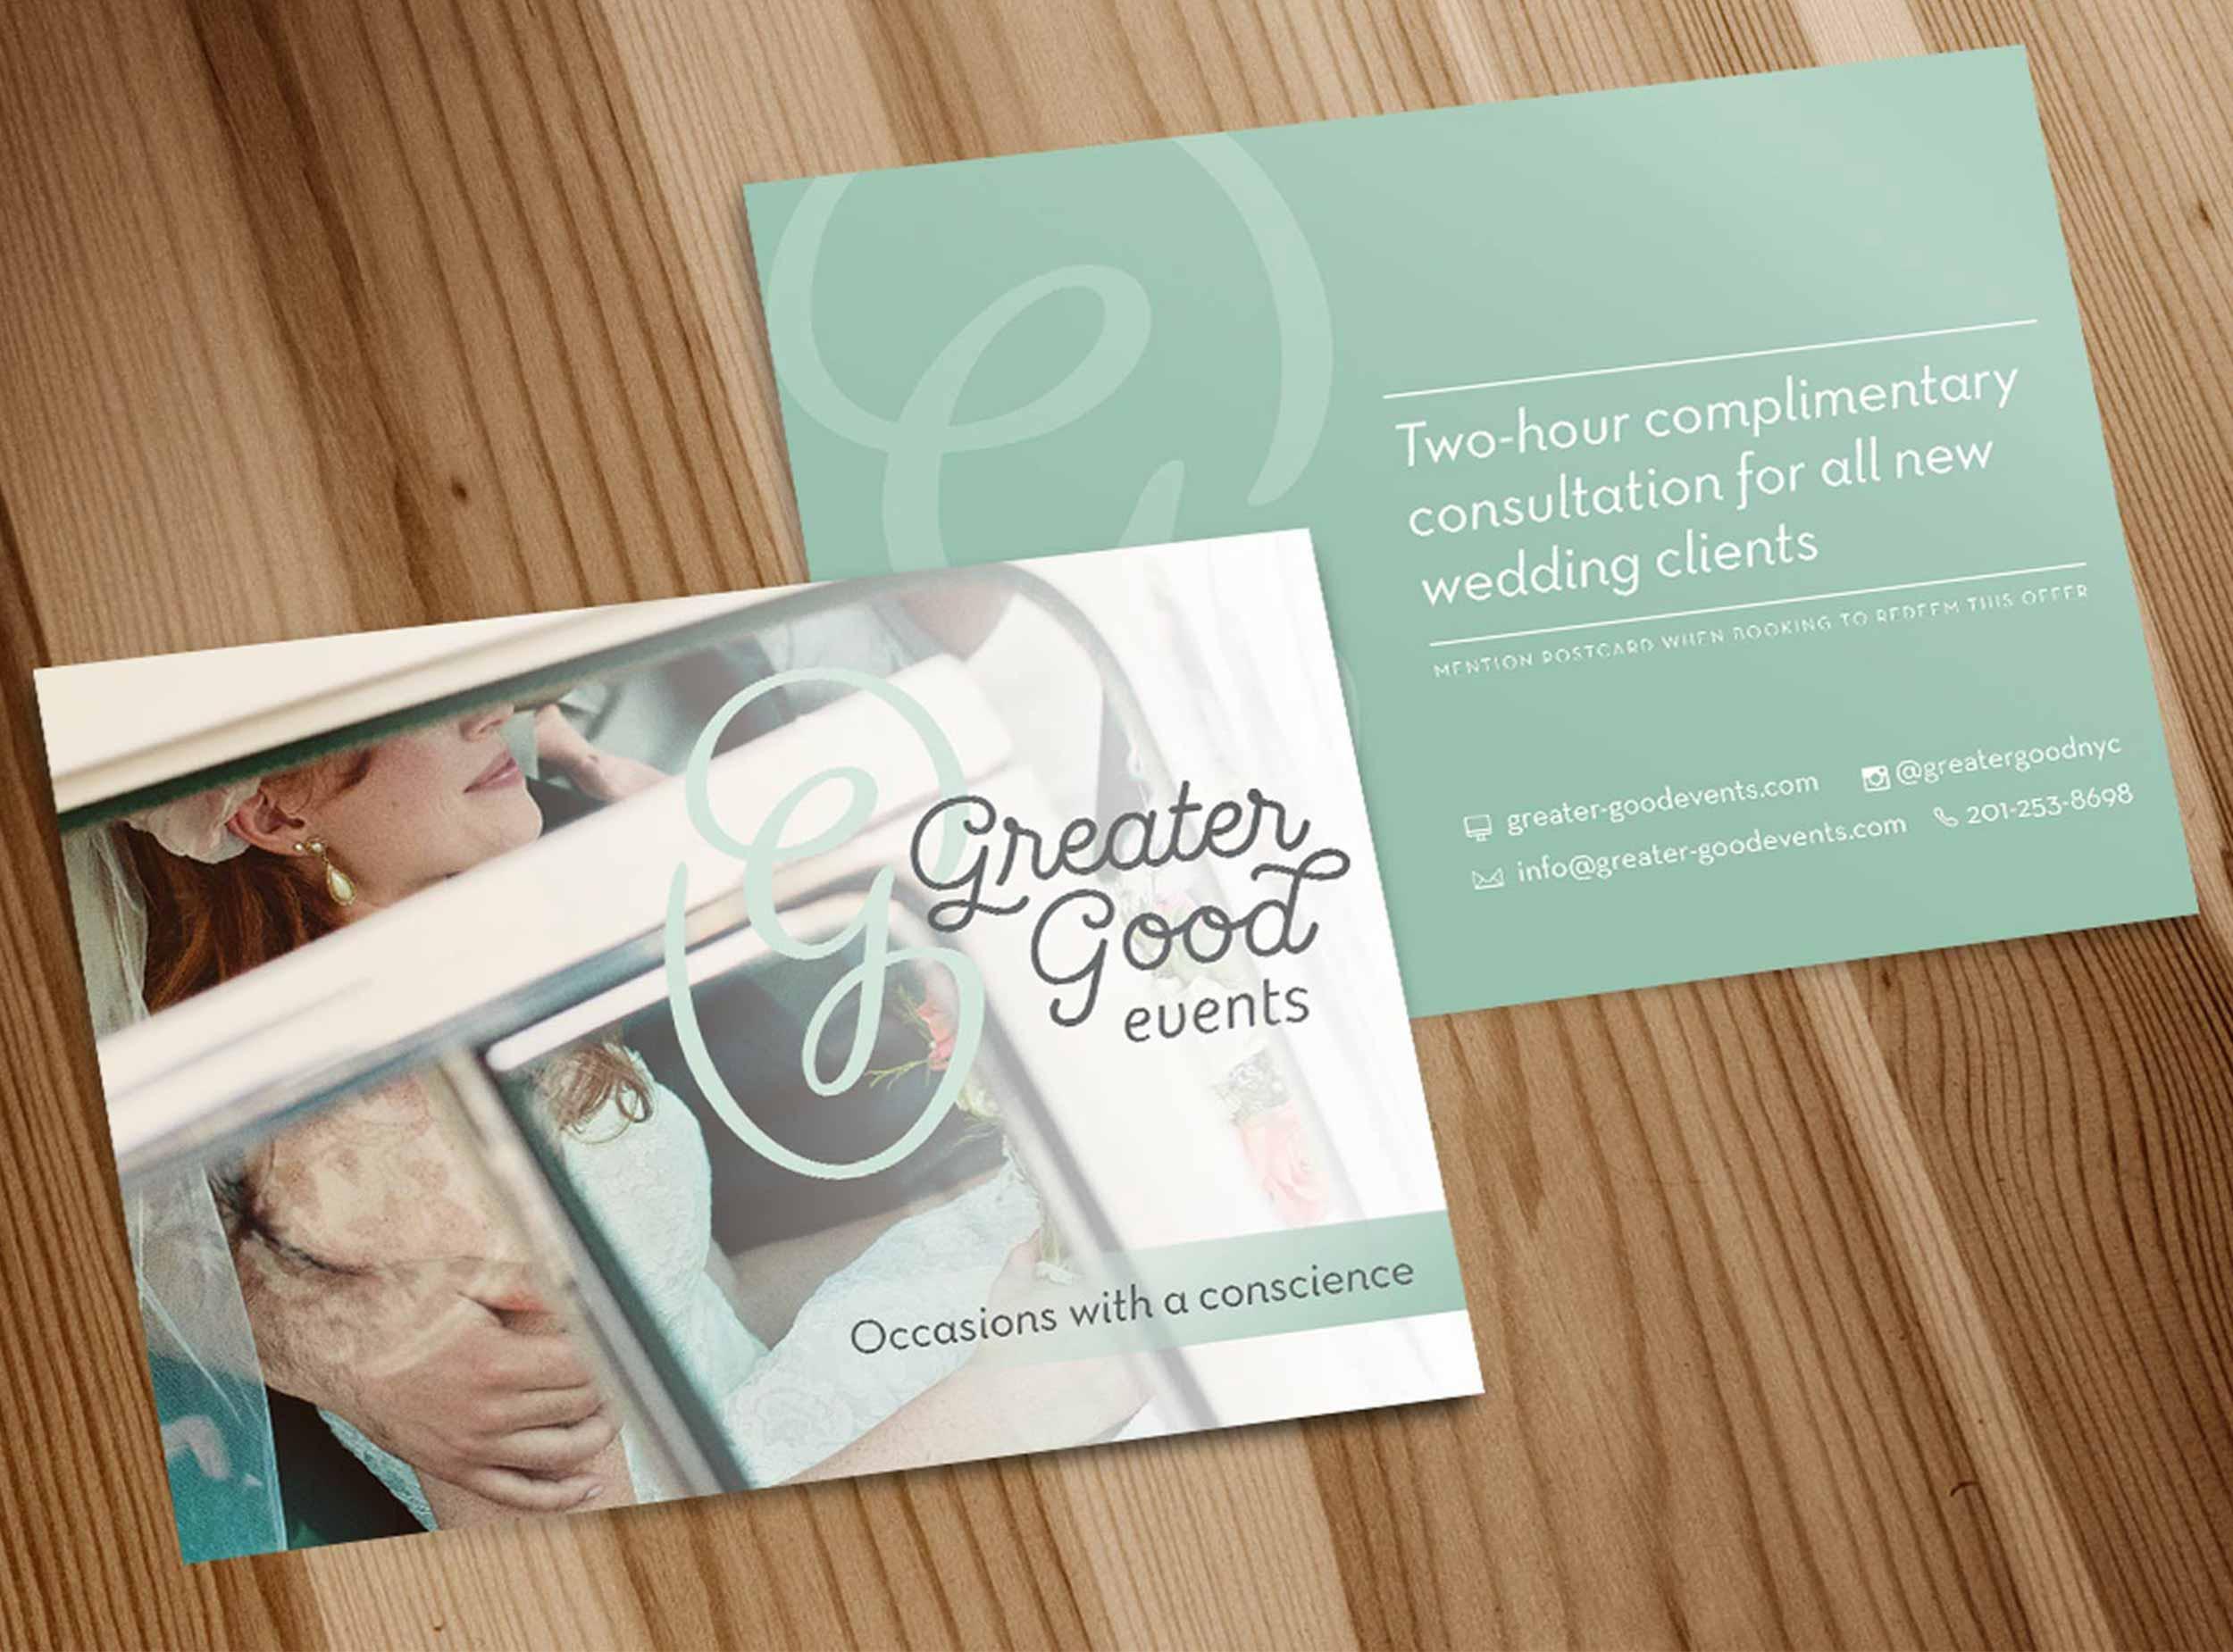 Greater Good Events' postcard design.